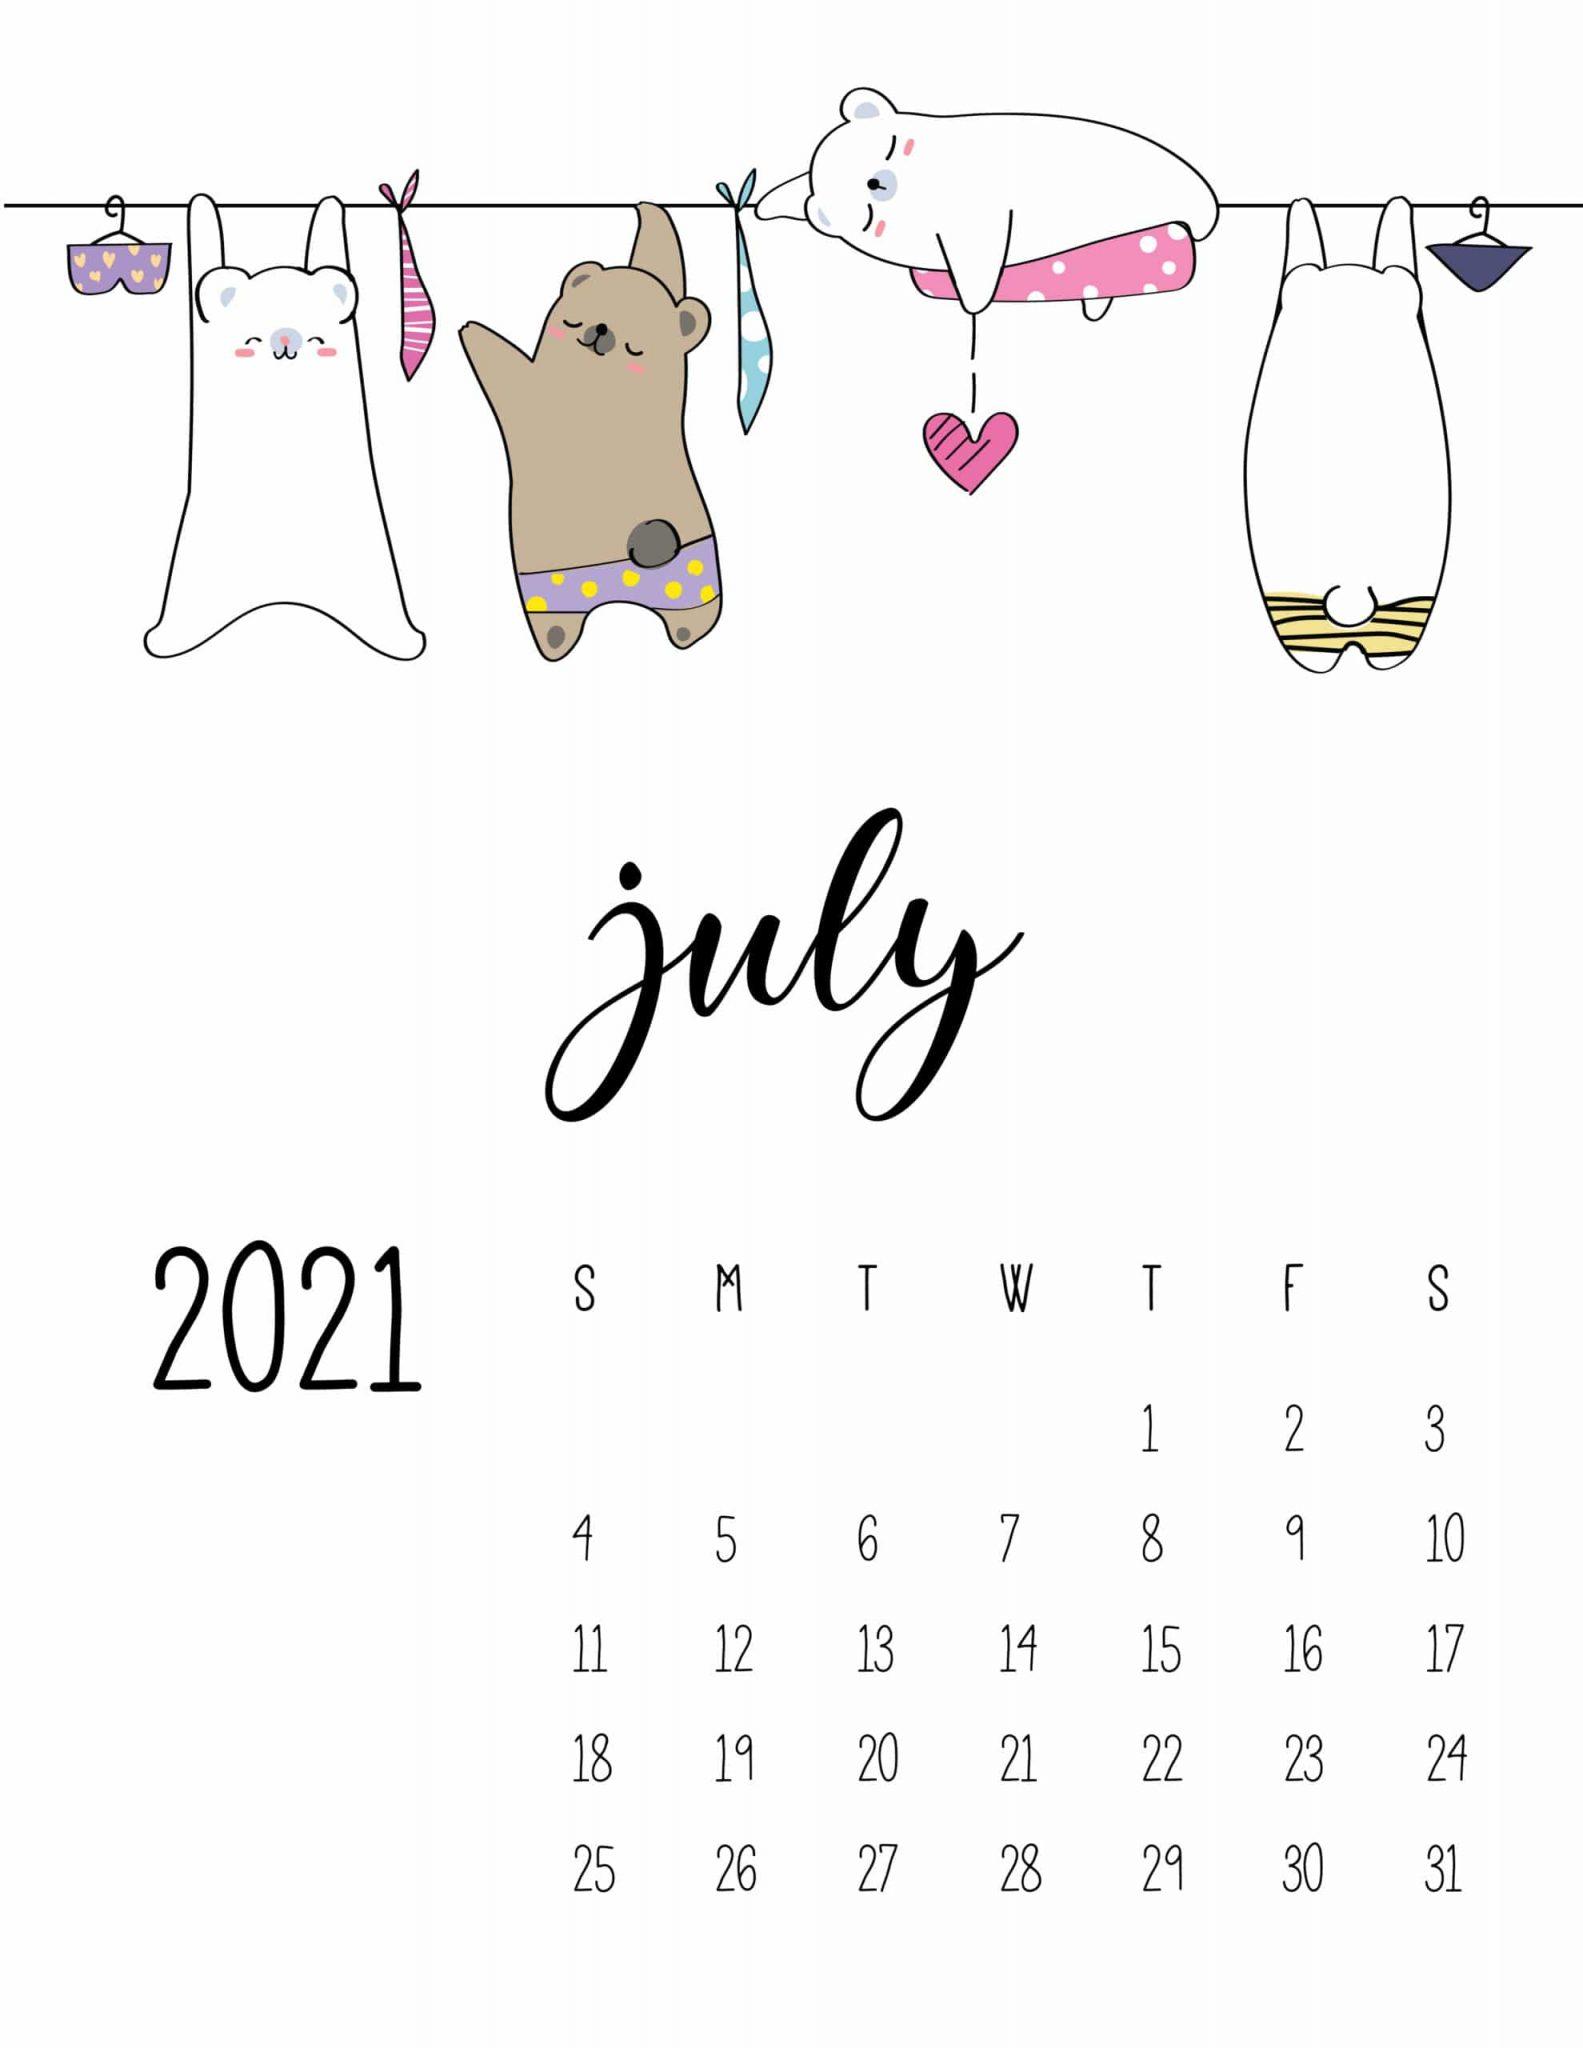 Cute July 2021 Calendar For Kids